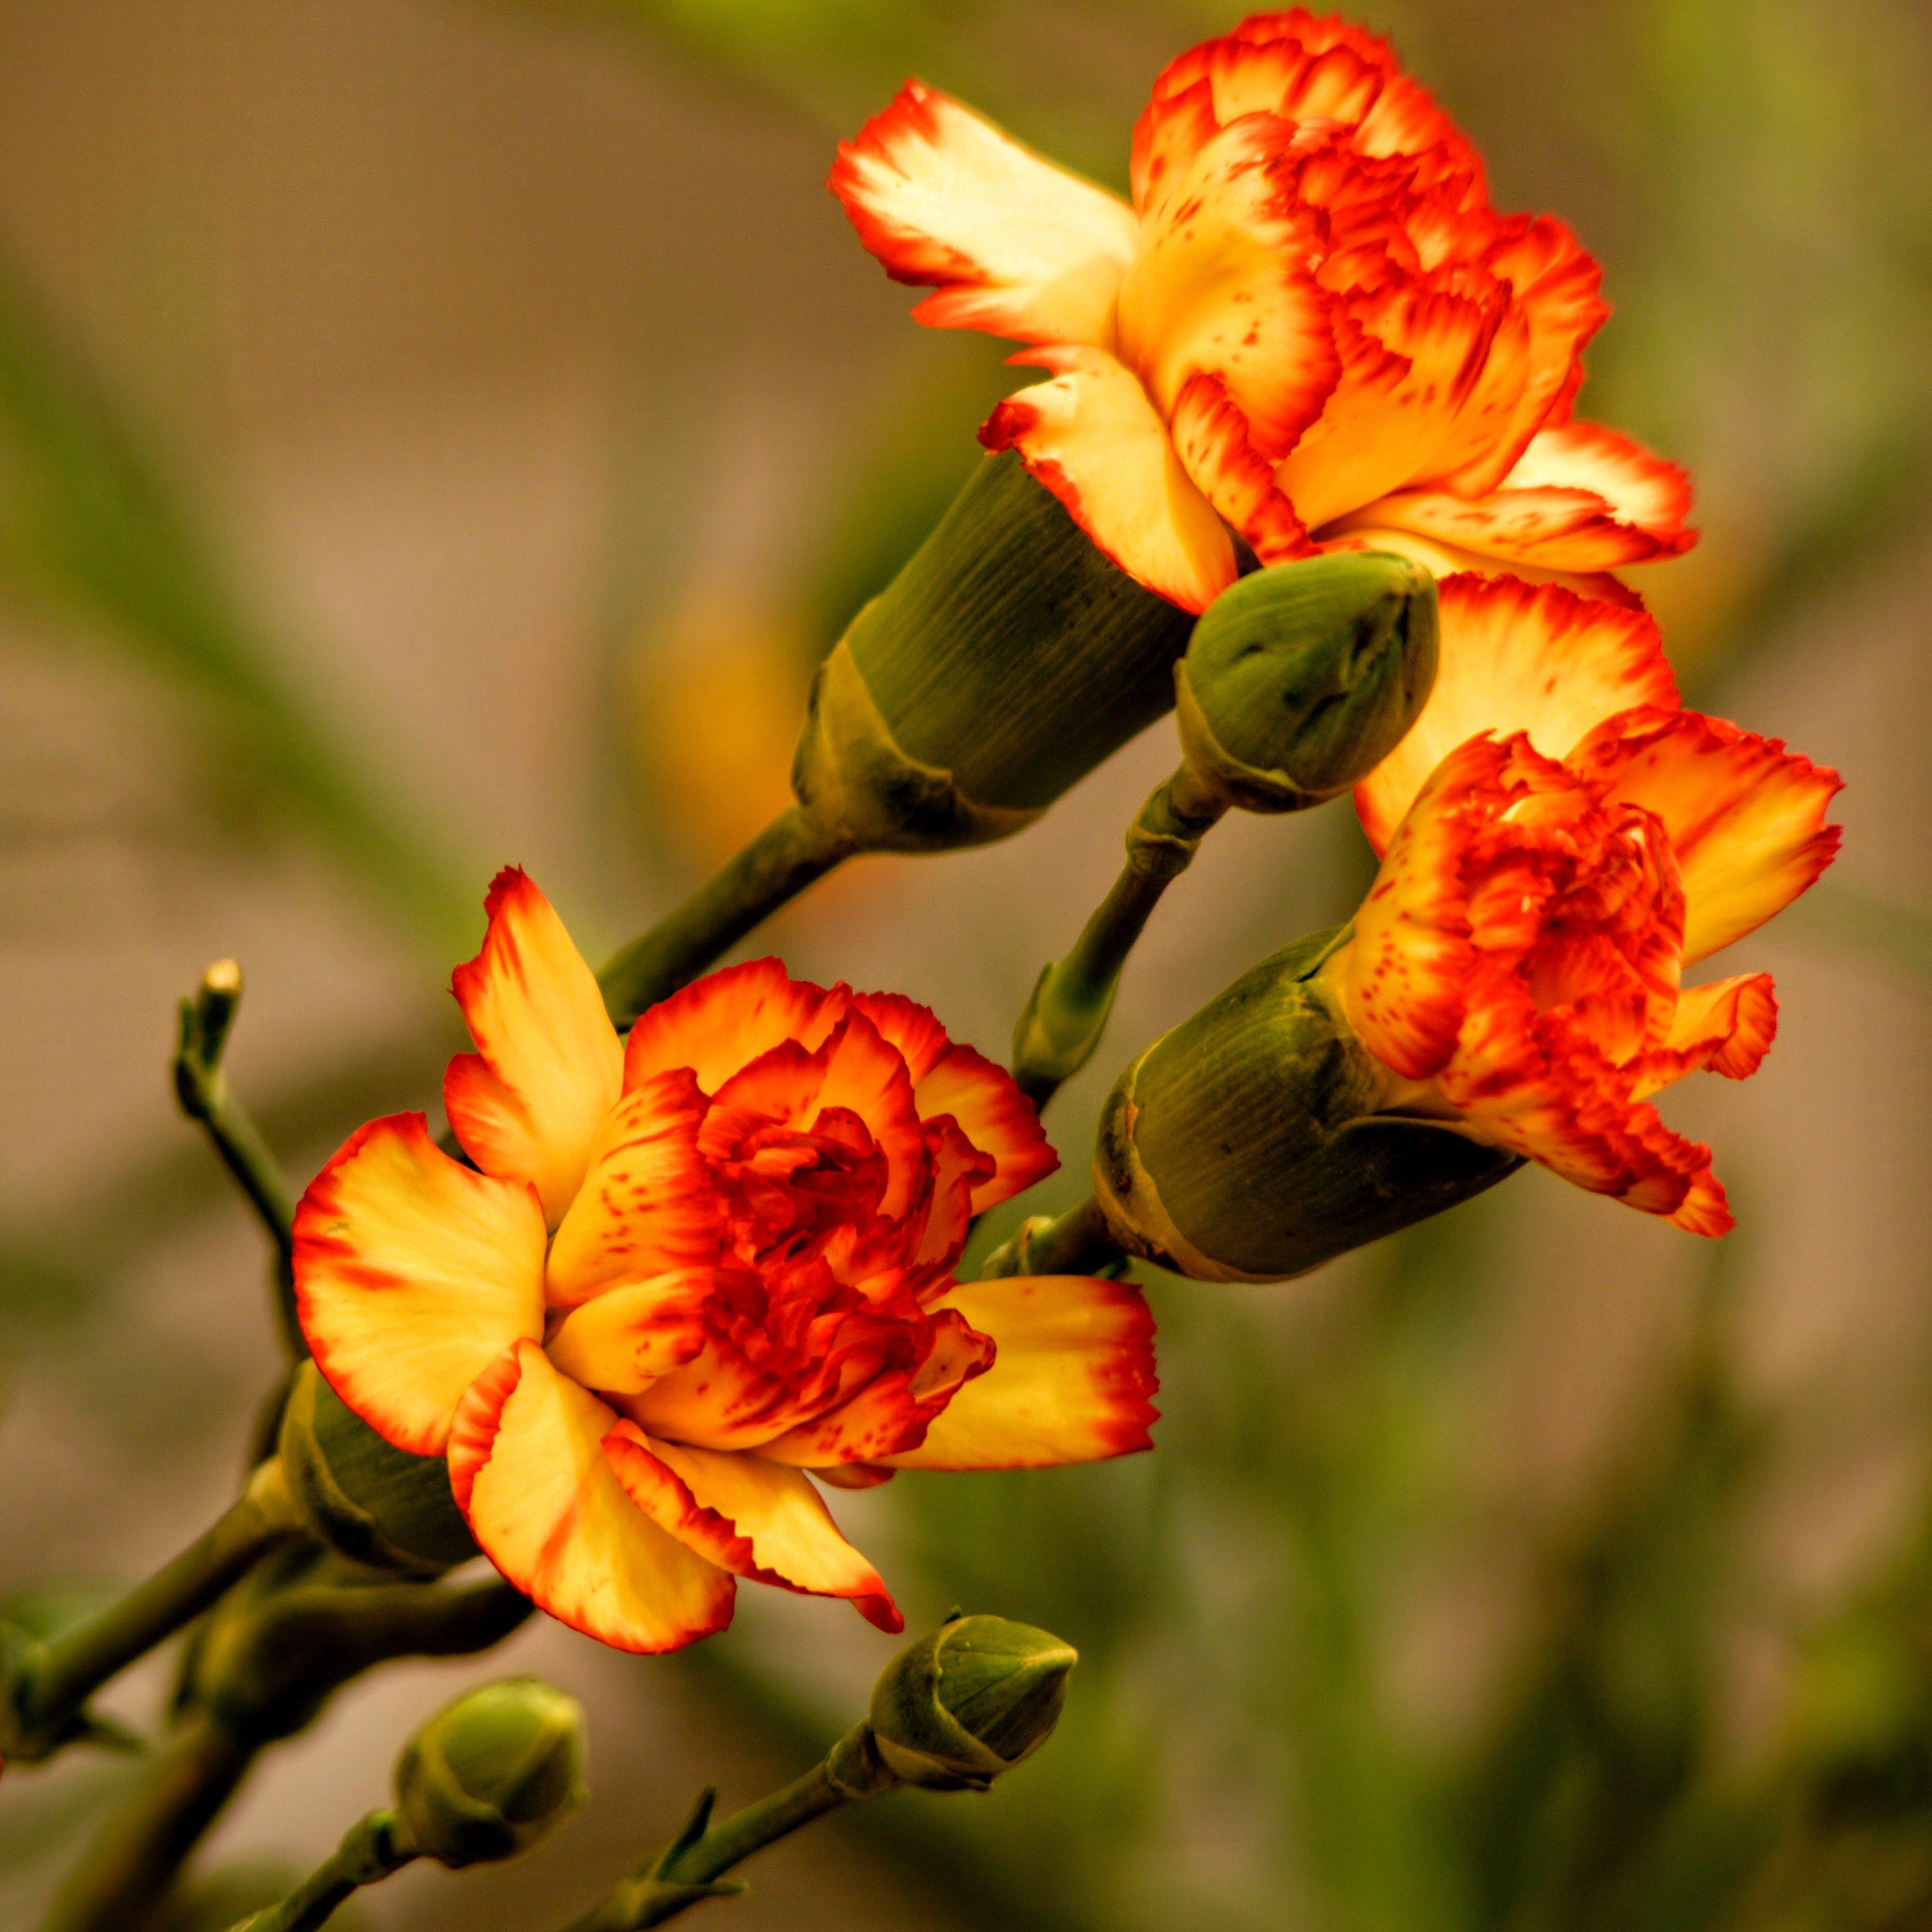 Kostenloses Stock Foto zu pflanze, blume, nelke